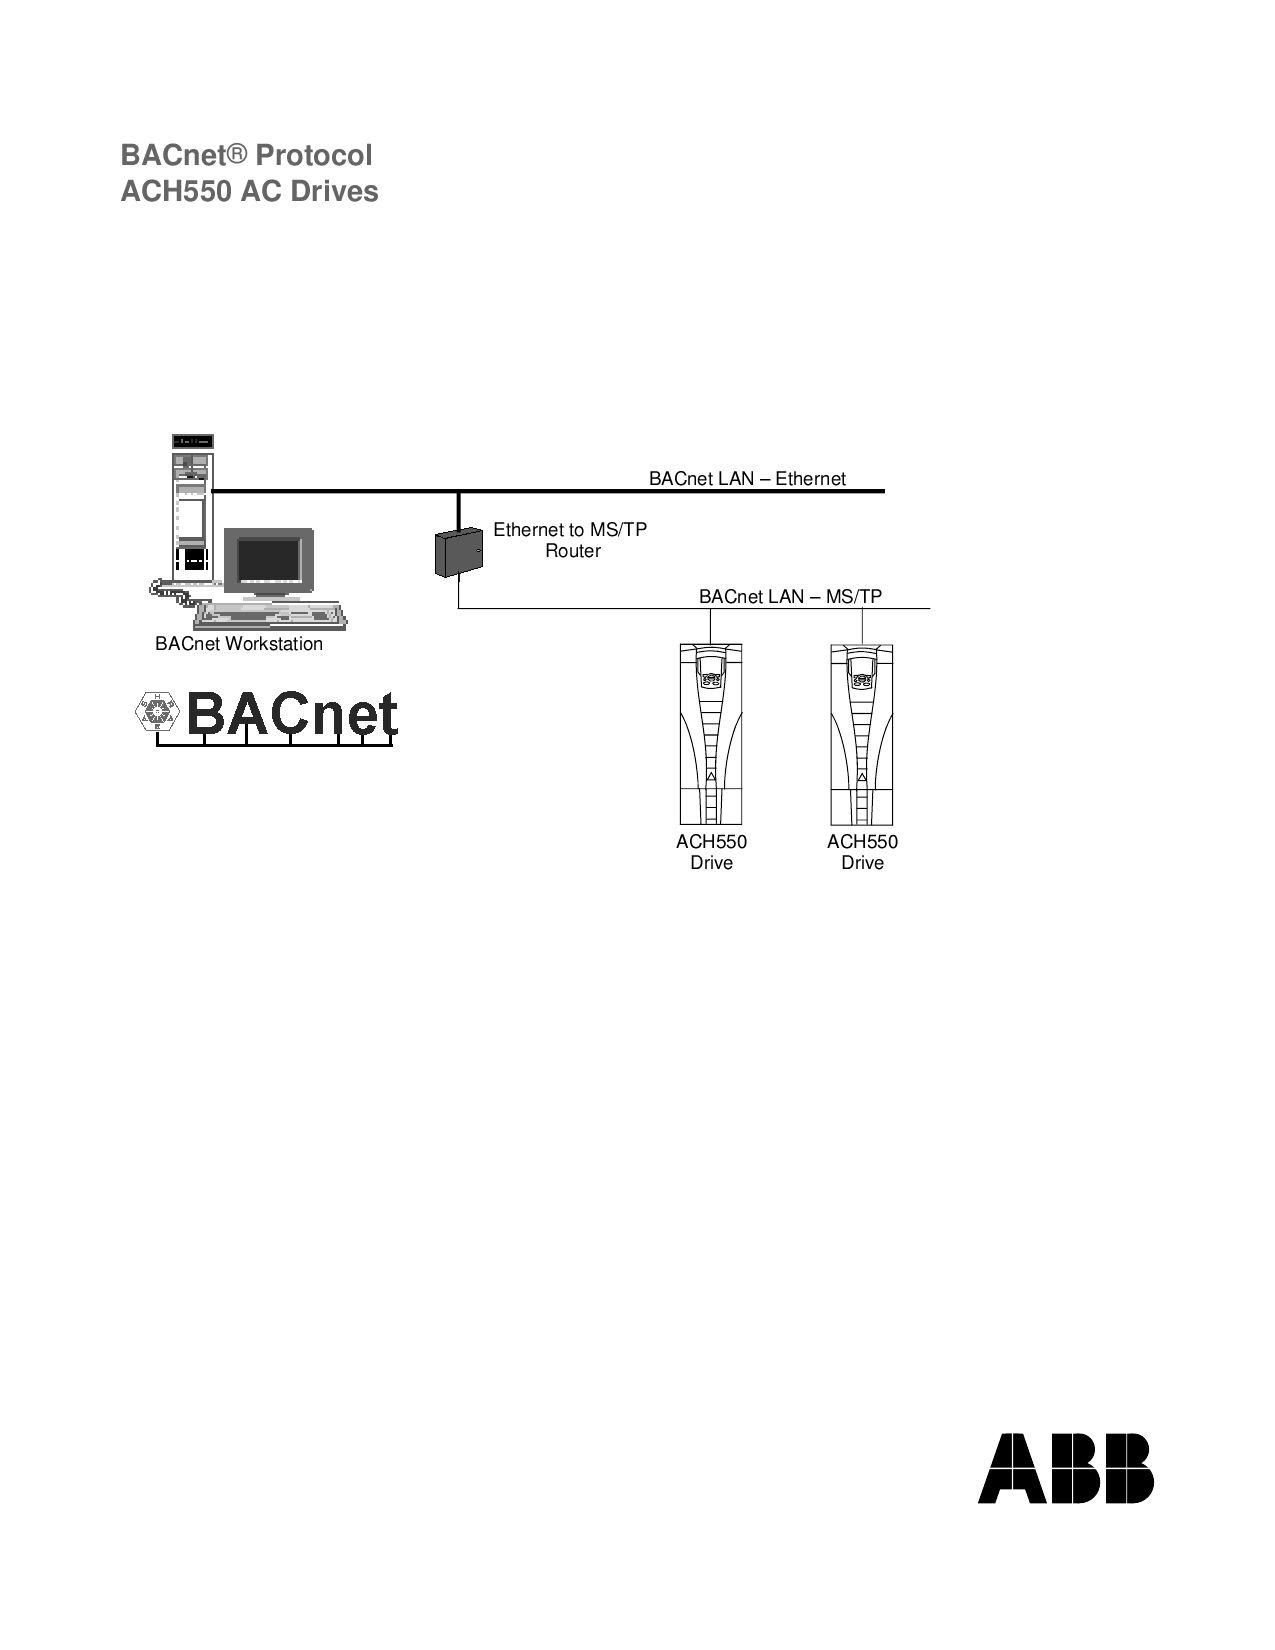 http://library.abb.com/global/scot/scot201.nsf/veritydisplay ... abb acs550 control wiring Issuu